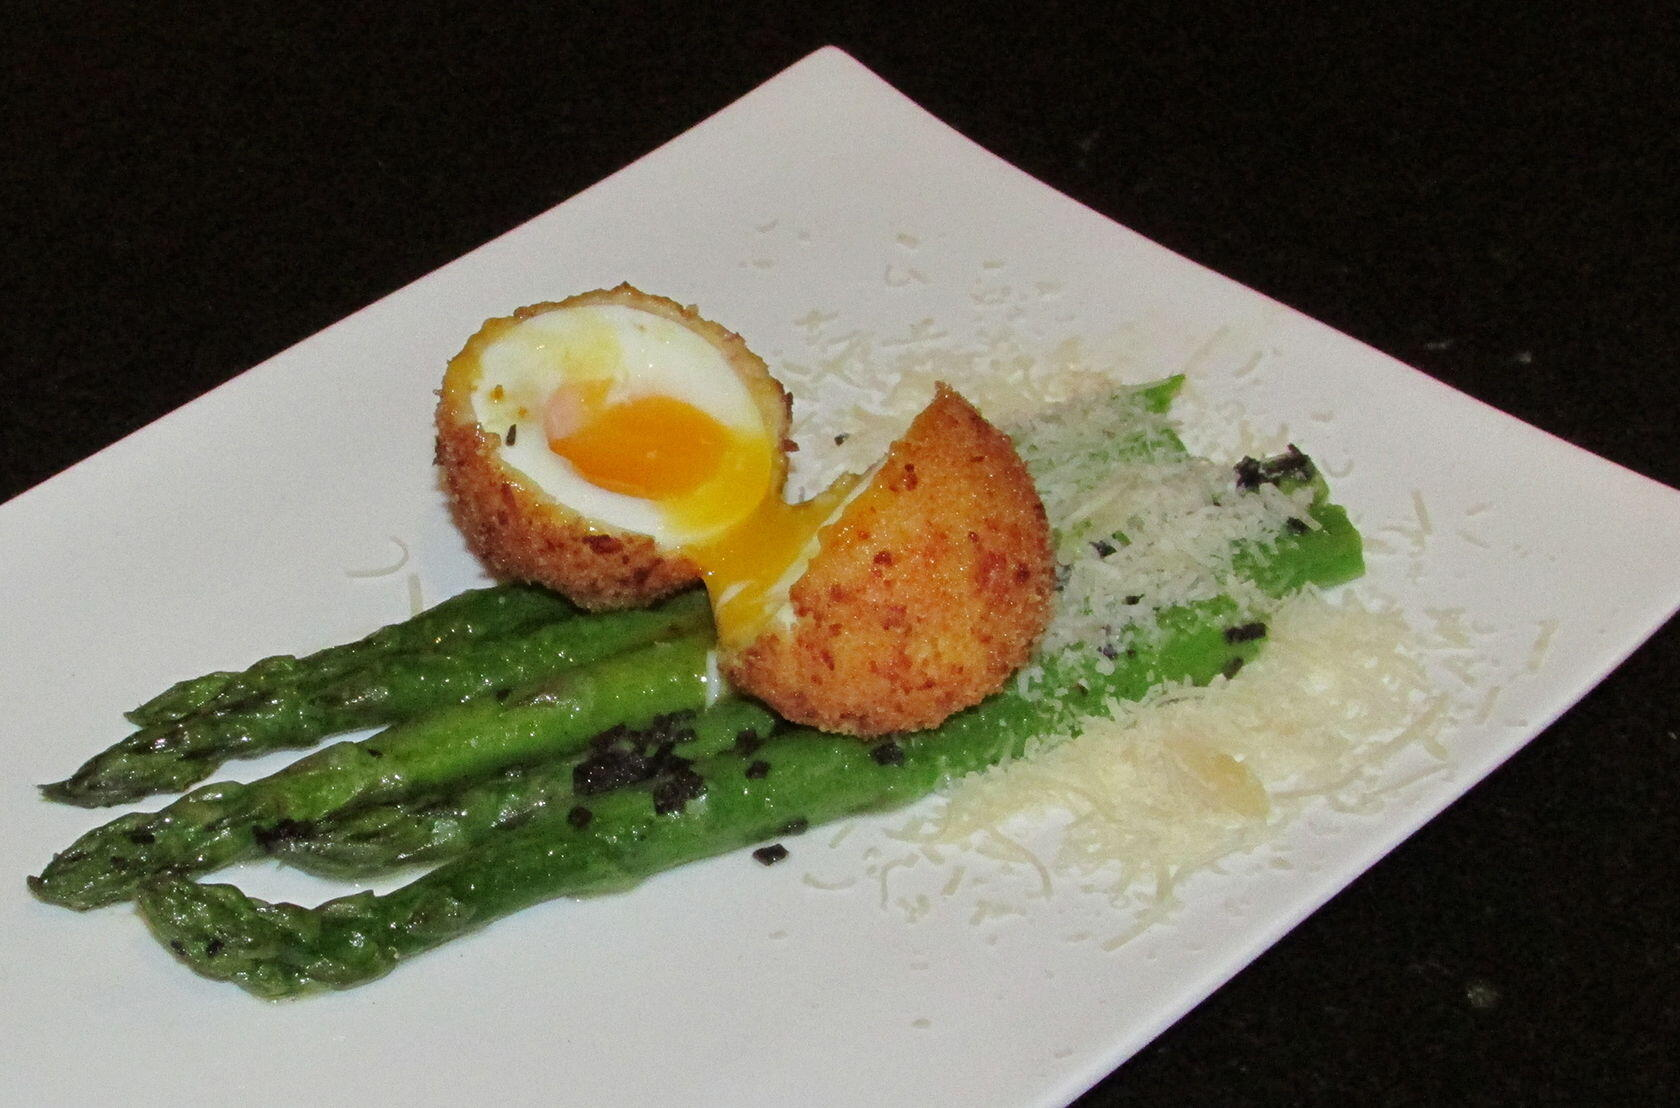 Asparagus with Deep Fried Egg @Masdaugustine